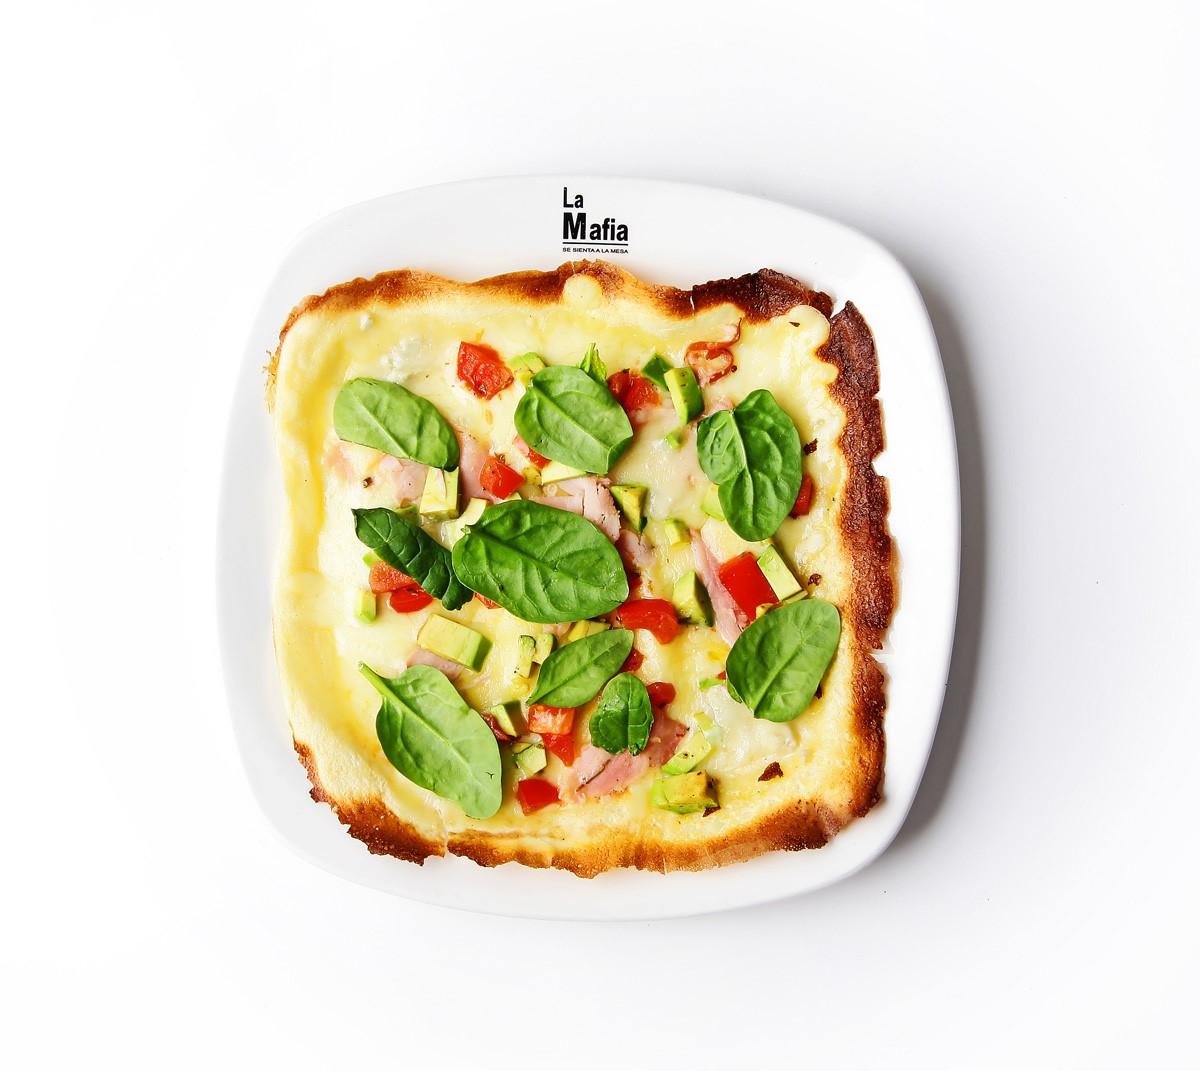 Crepe aguacate La Mafia se sienta a la mesa - Gorgonzola, una muestra más de la riqueza quesera de Italia